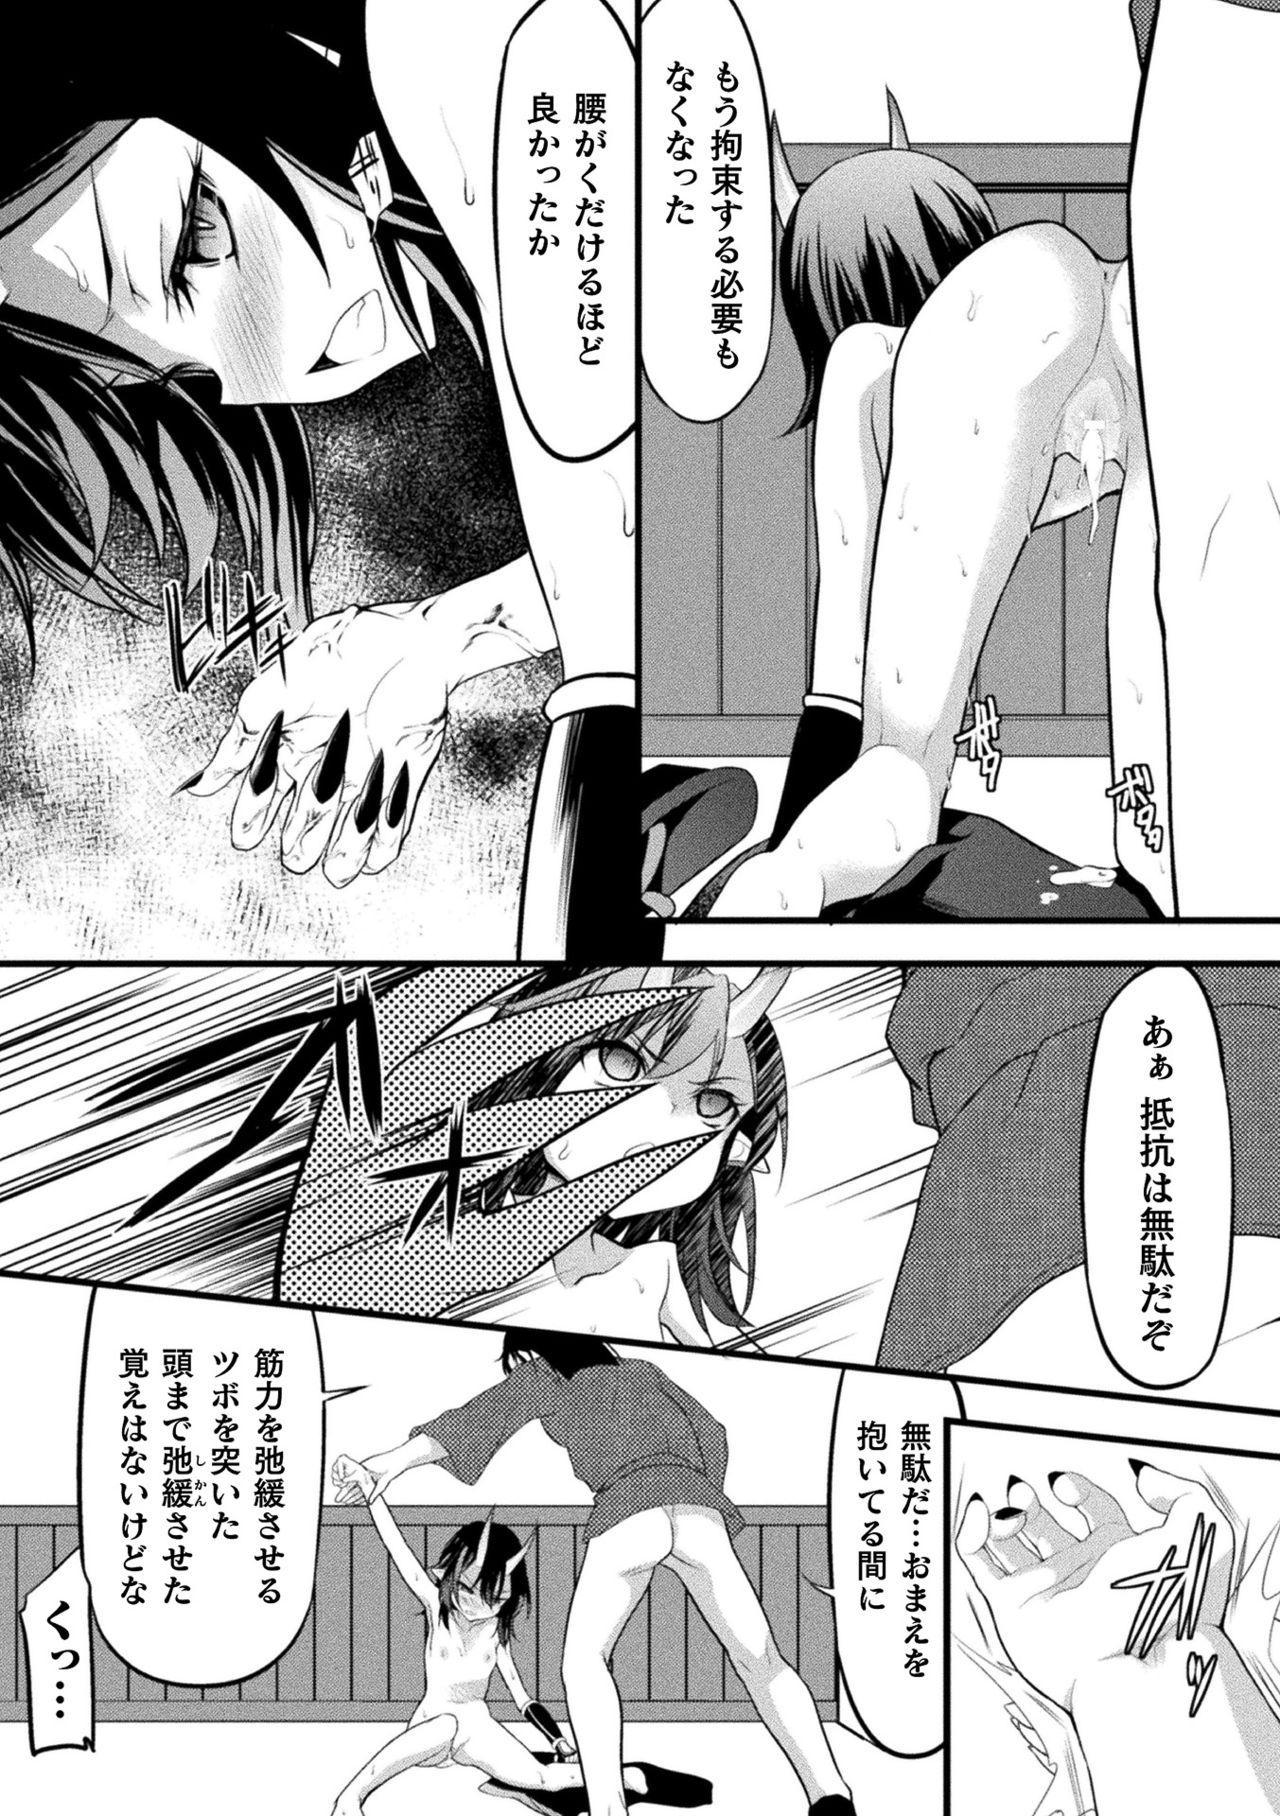 Loli-babaa Kyousei Tanetsuke Ecchi! Vol. 2 36